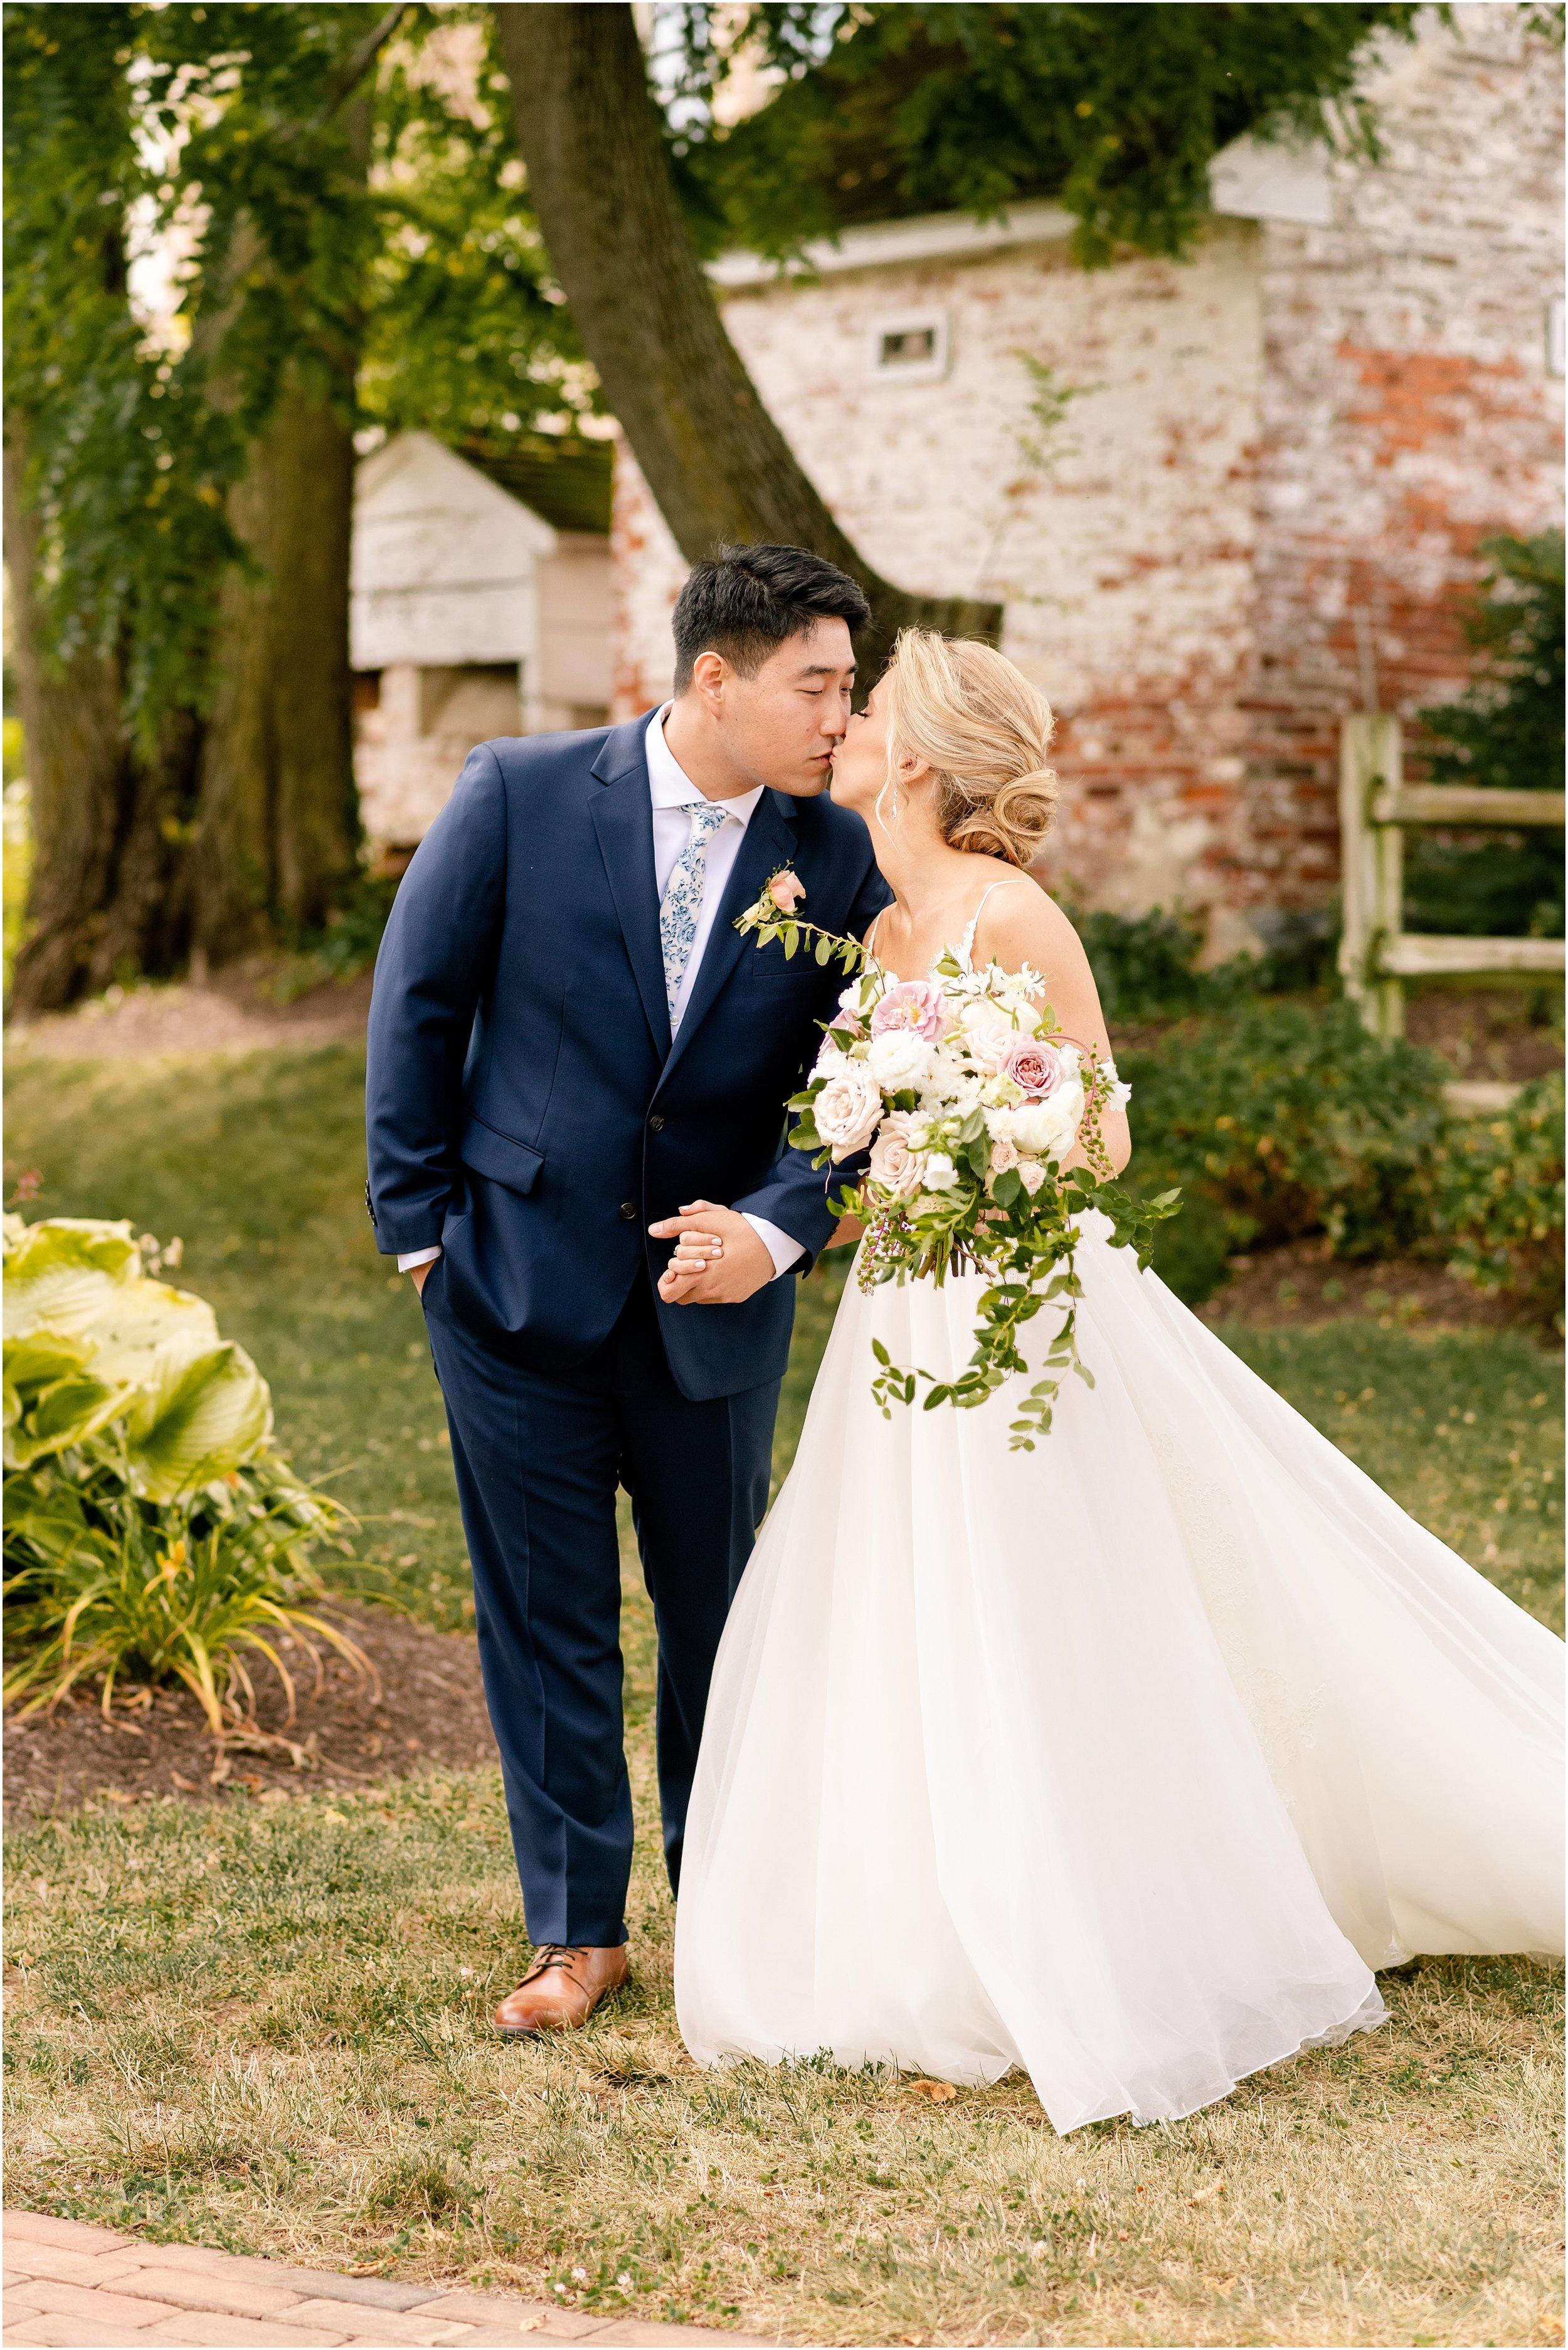 hannah leigh photography Walkers Overlook Wedding Walkersville MD_3504.jpg